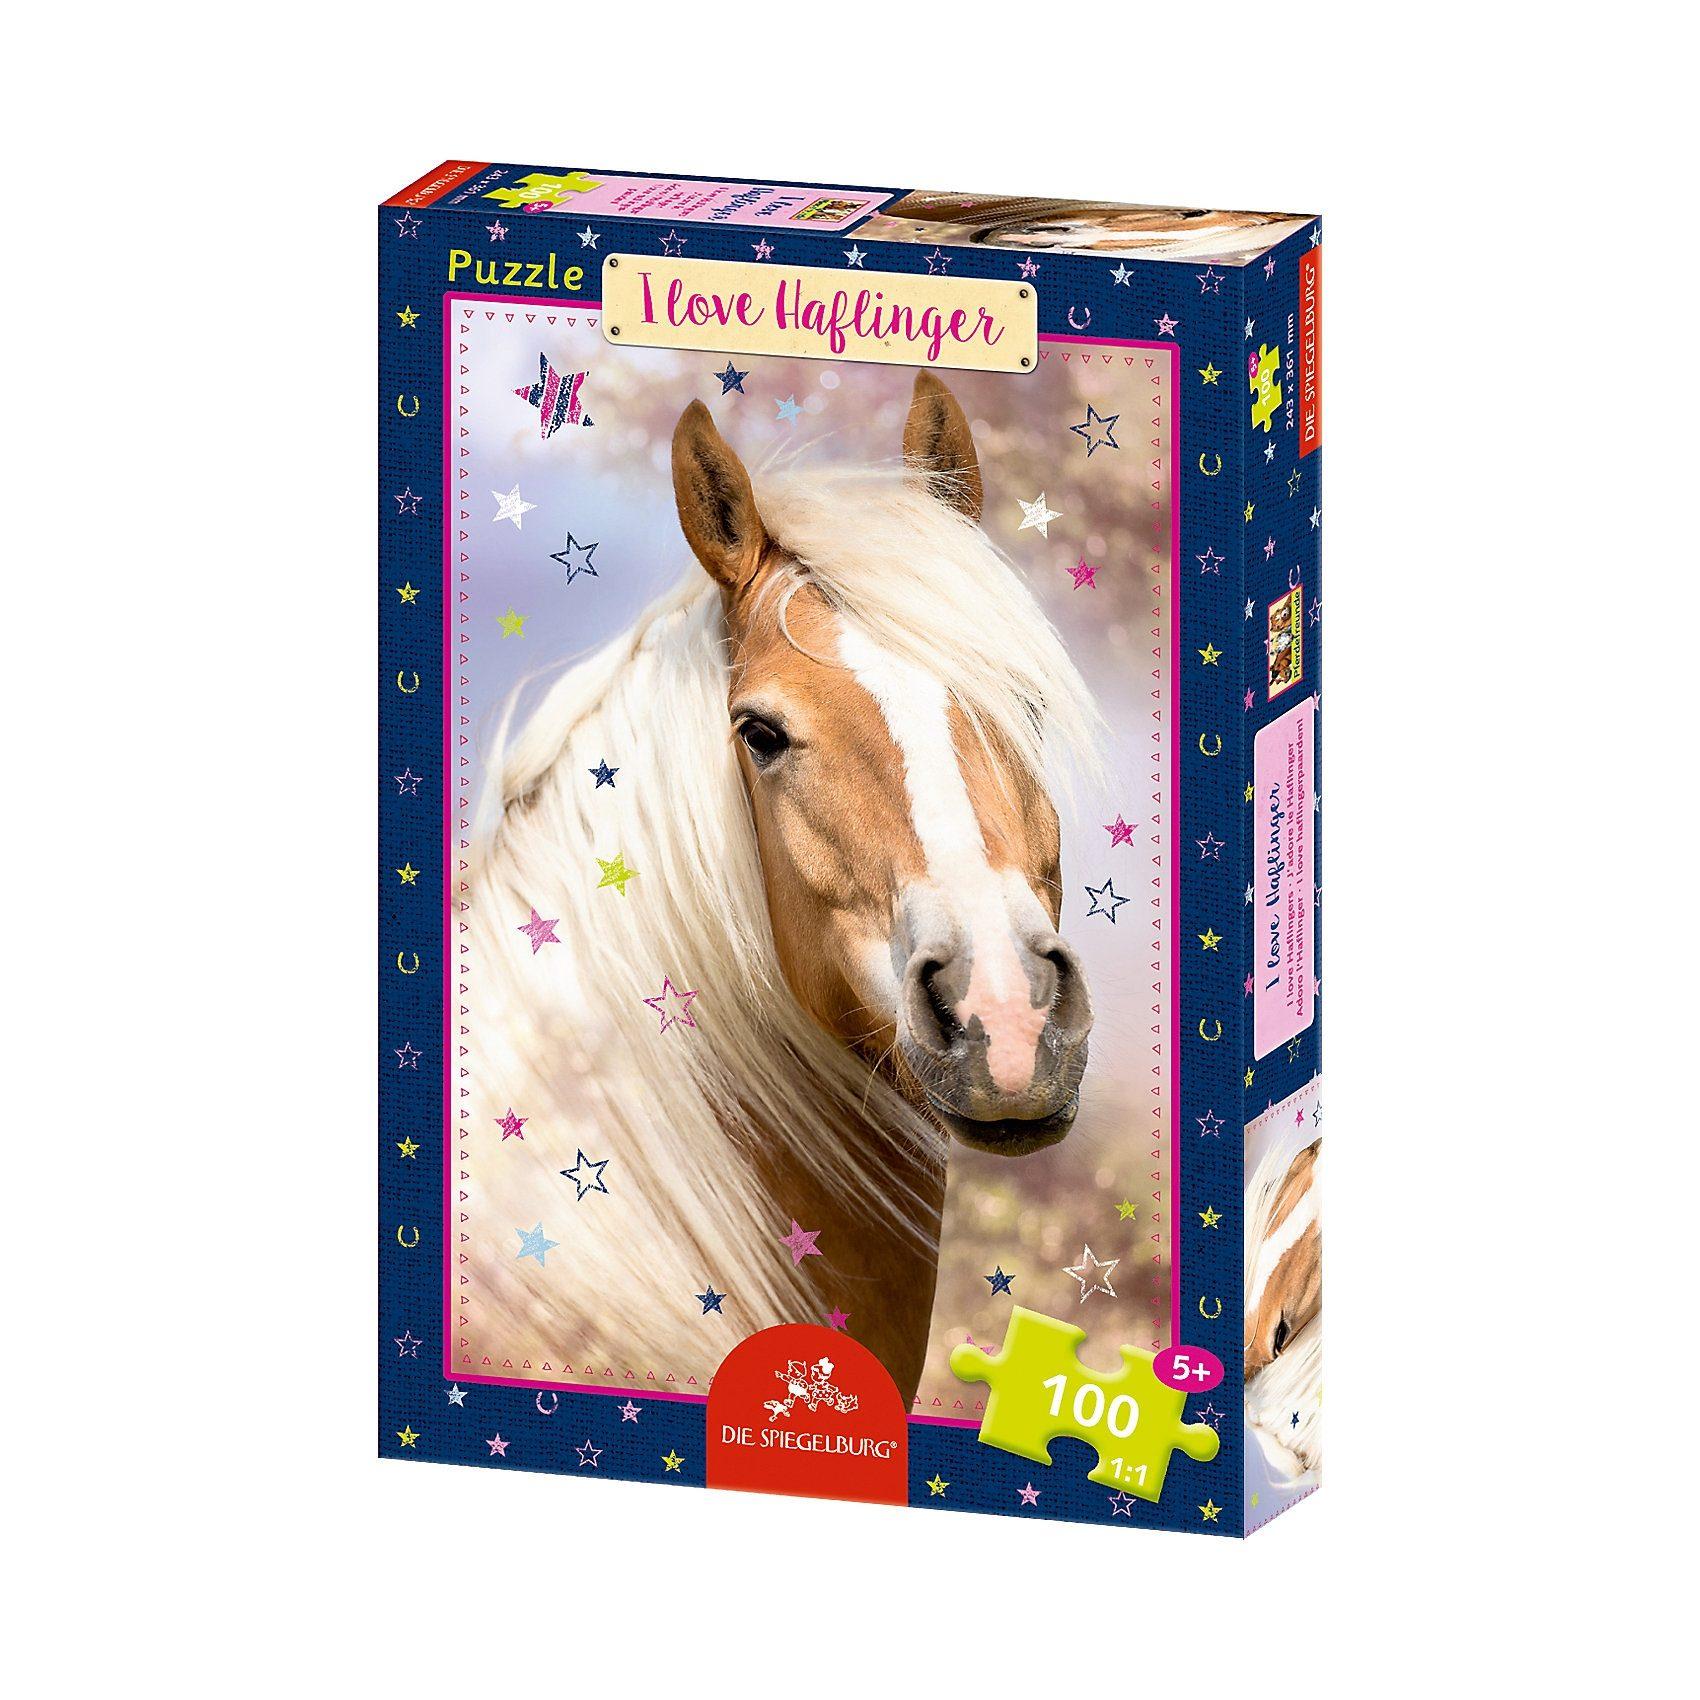 Spiegelburg Boxpuzzle I love Haflinger Pferdefreunde (100 Teile)